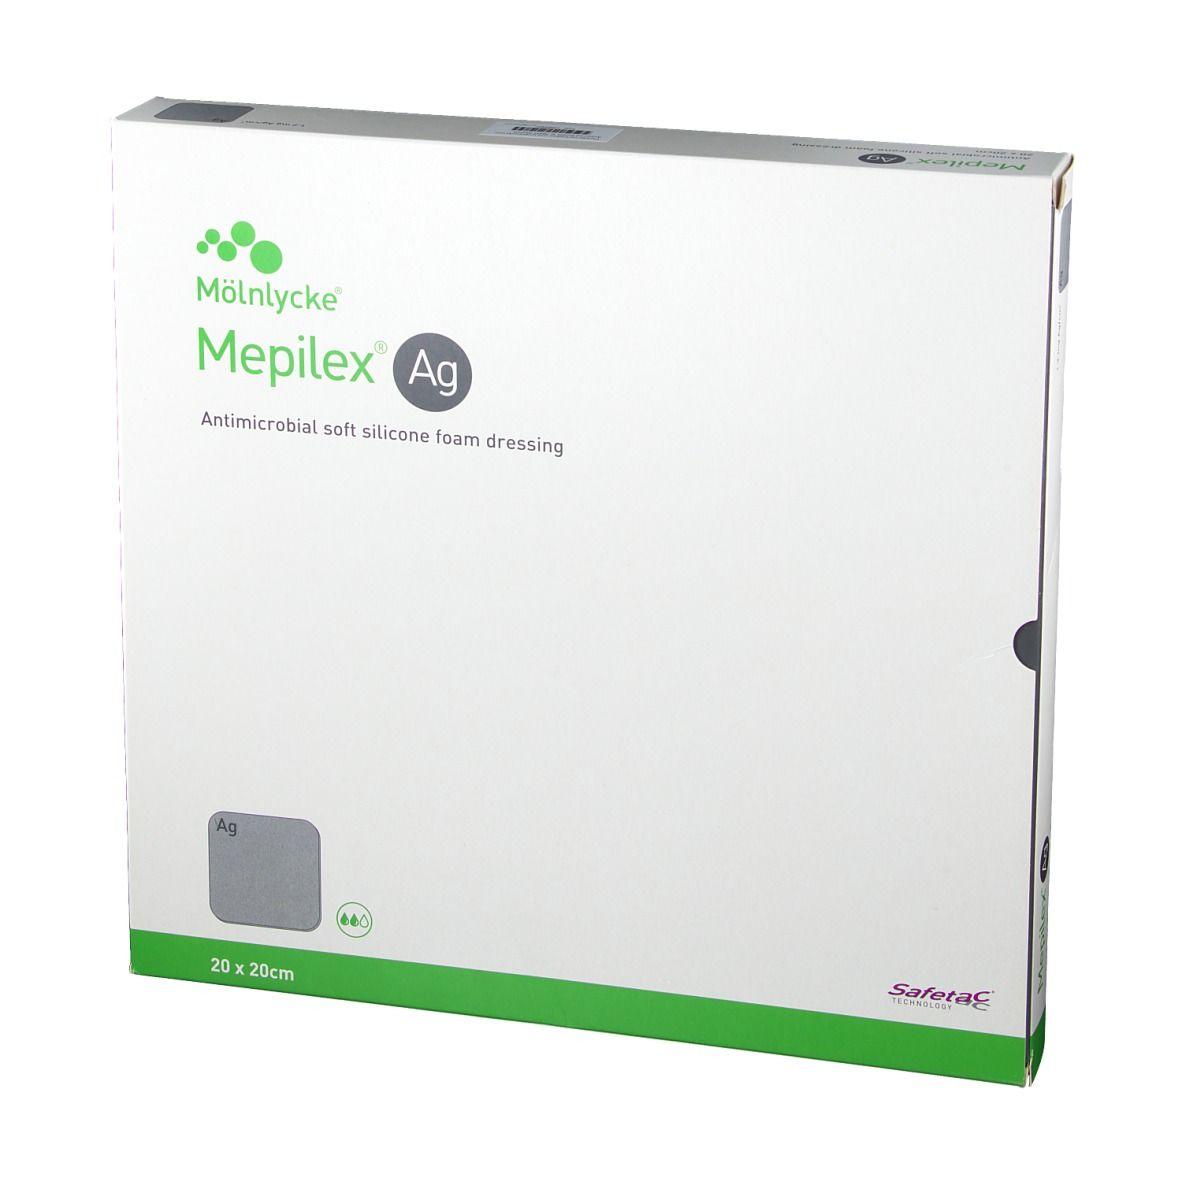 Mepilex® Ag 20 x 20 cm